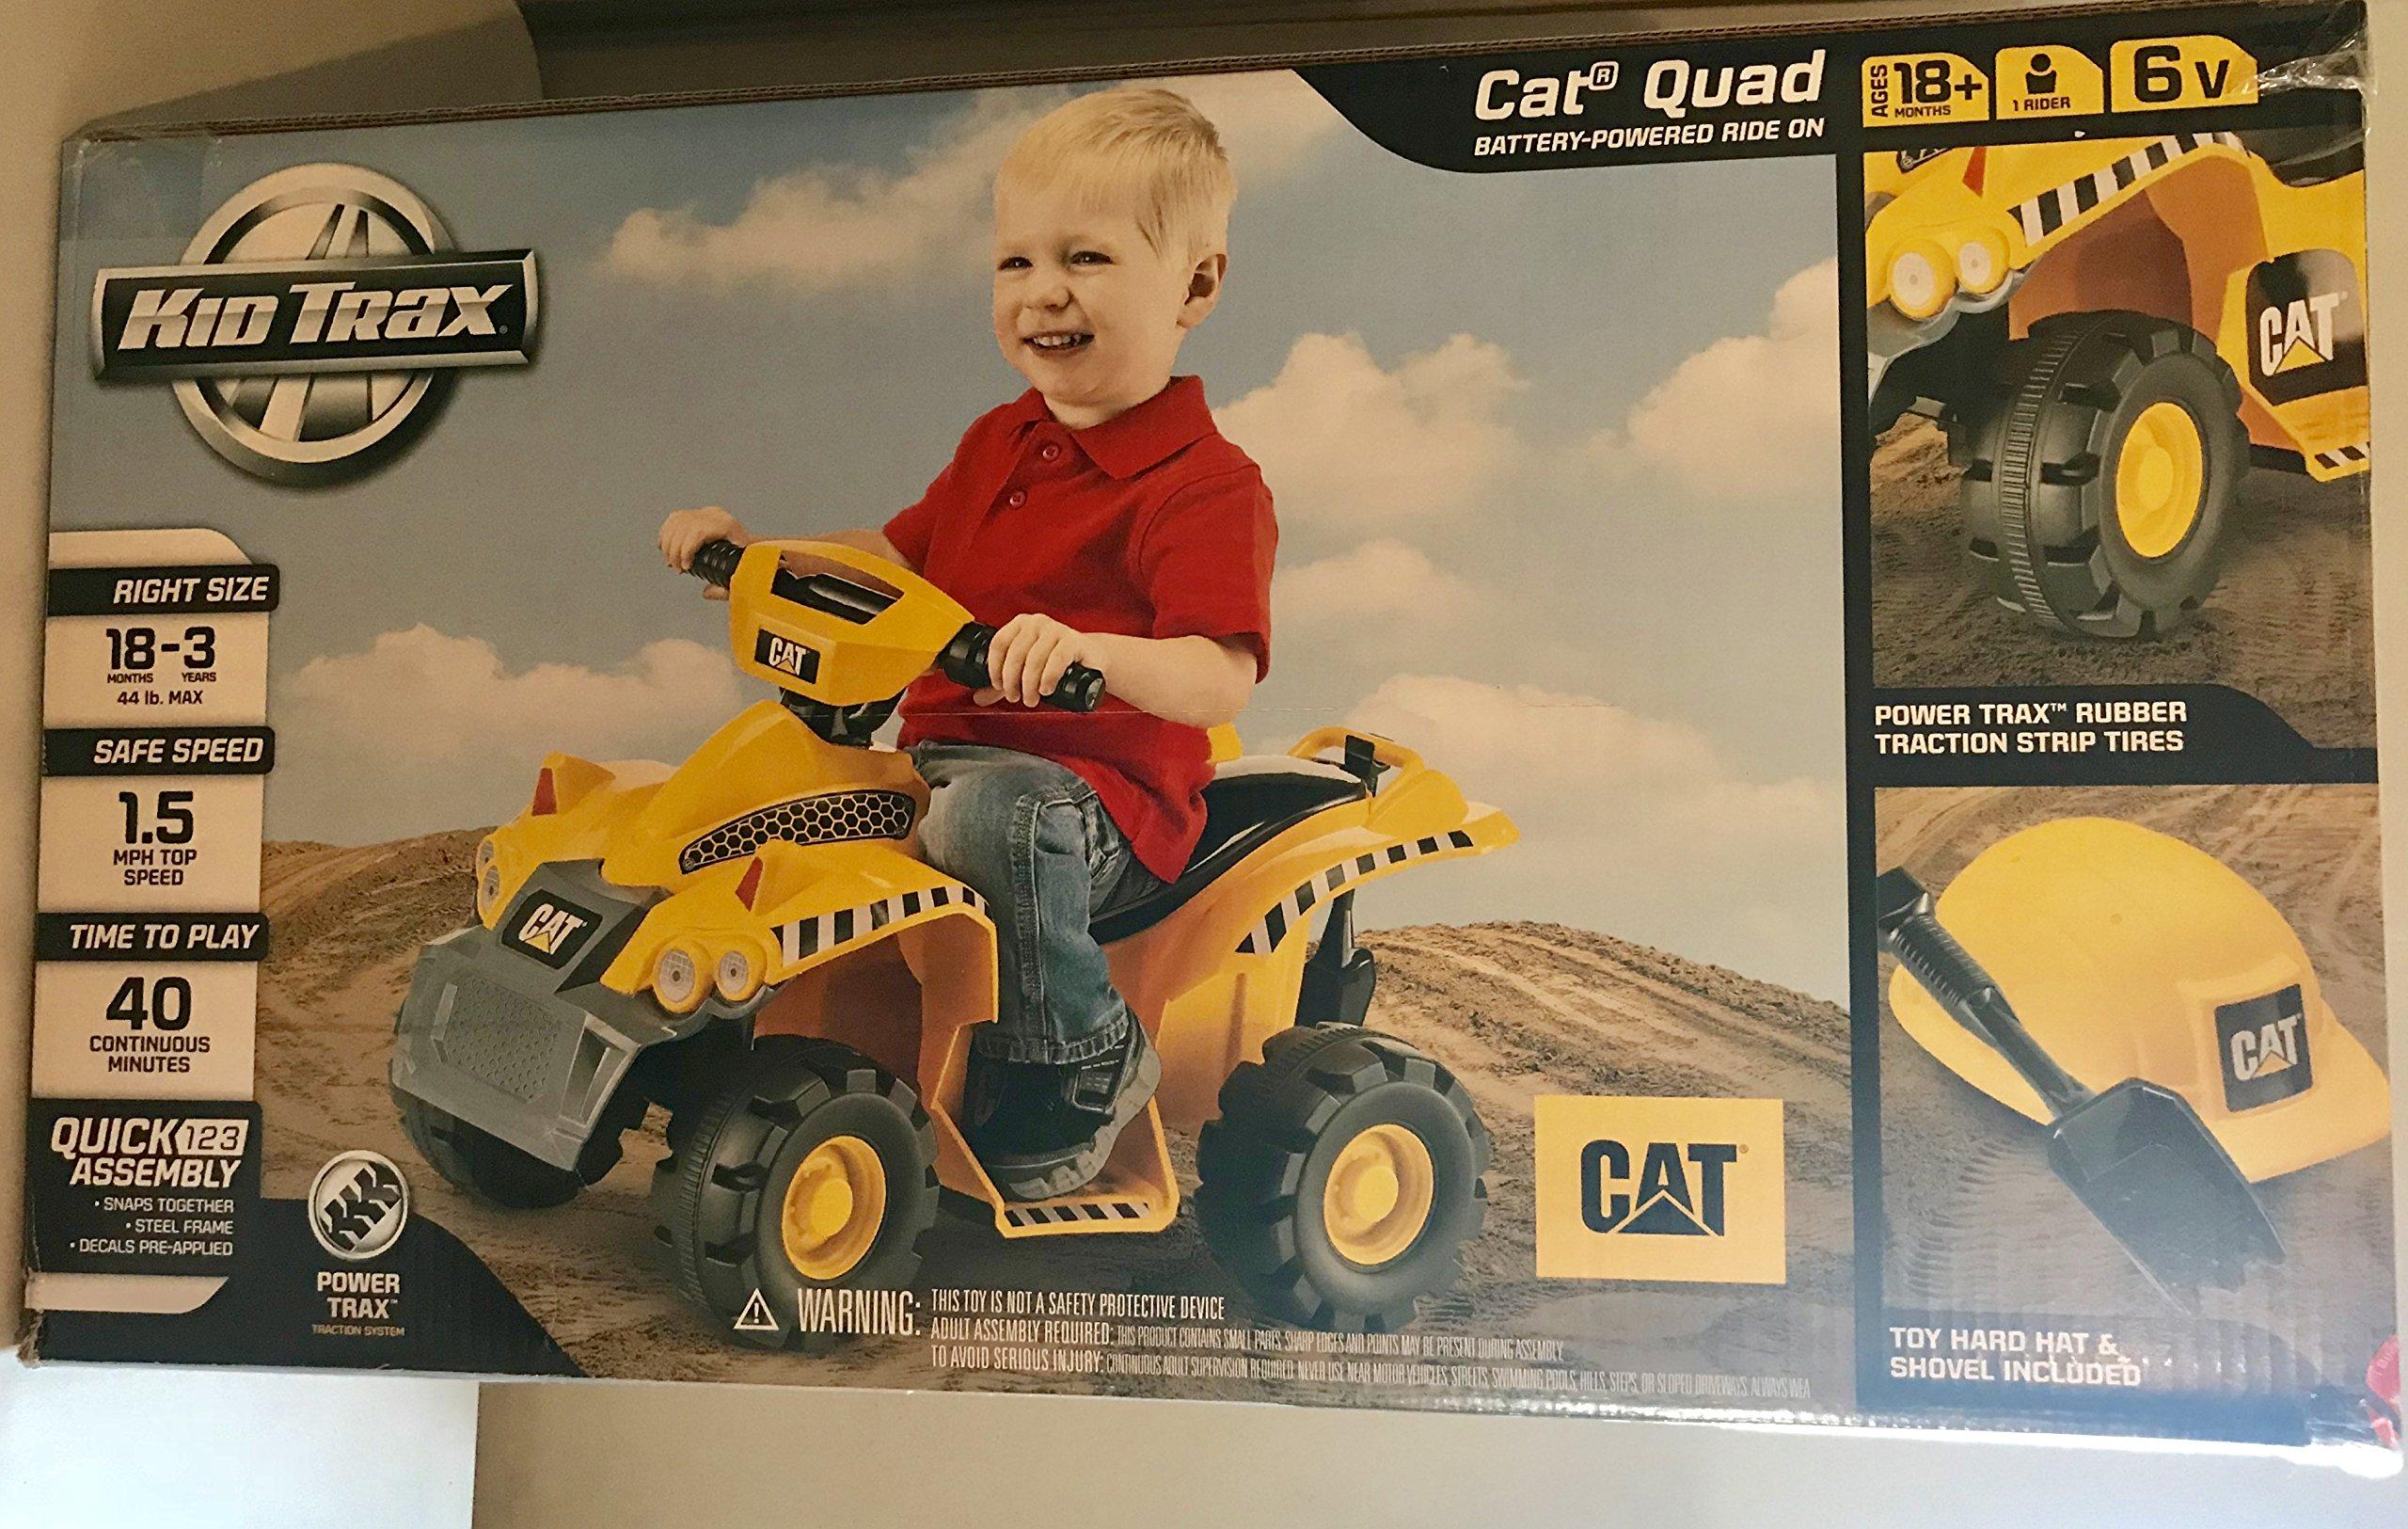 Pacific Kid Trax CAT 6V Quad Ride On